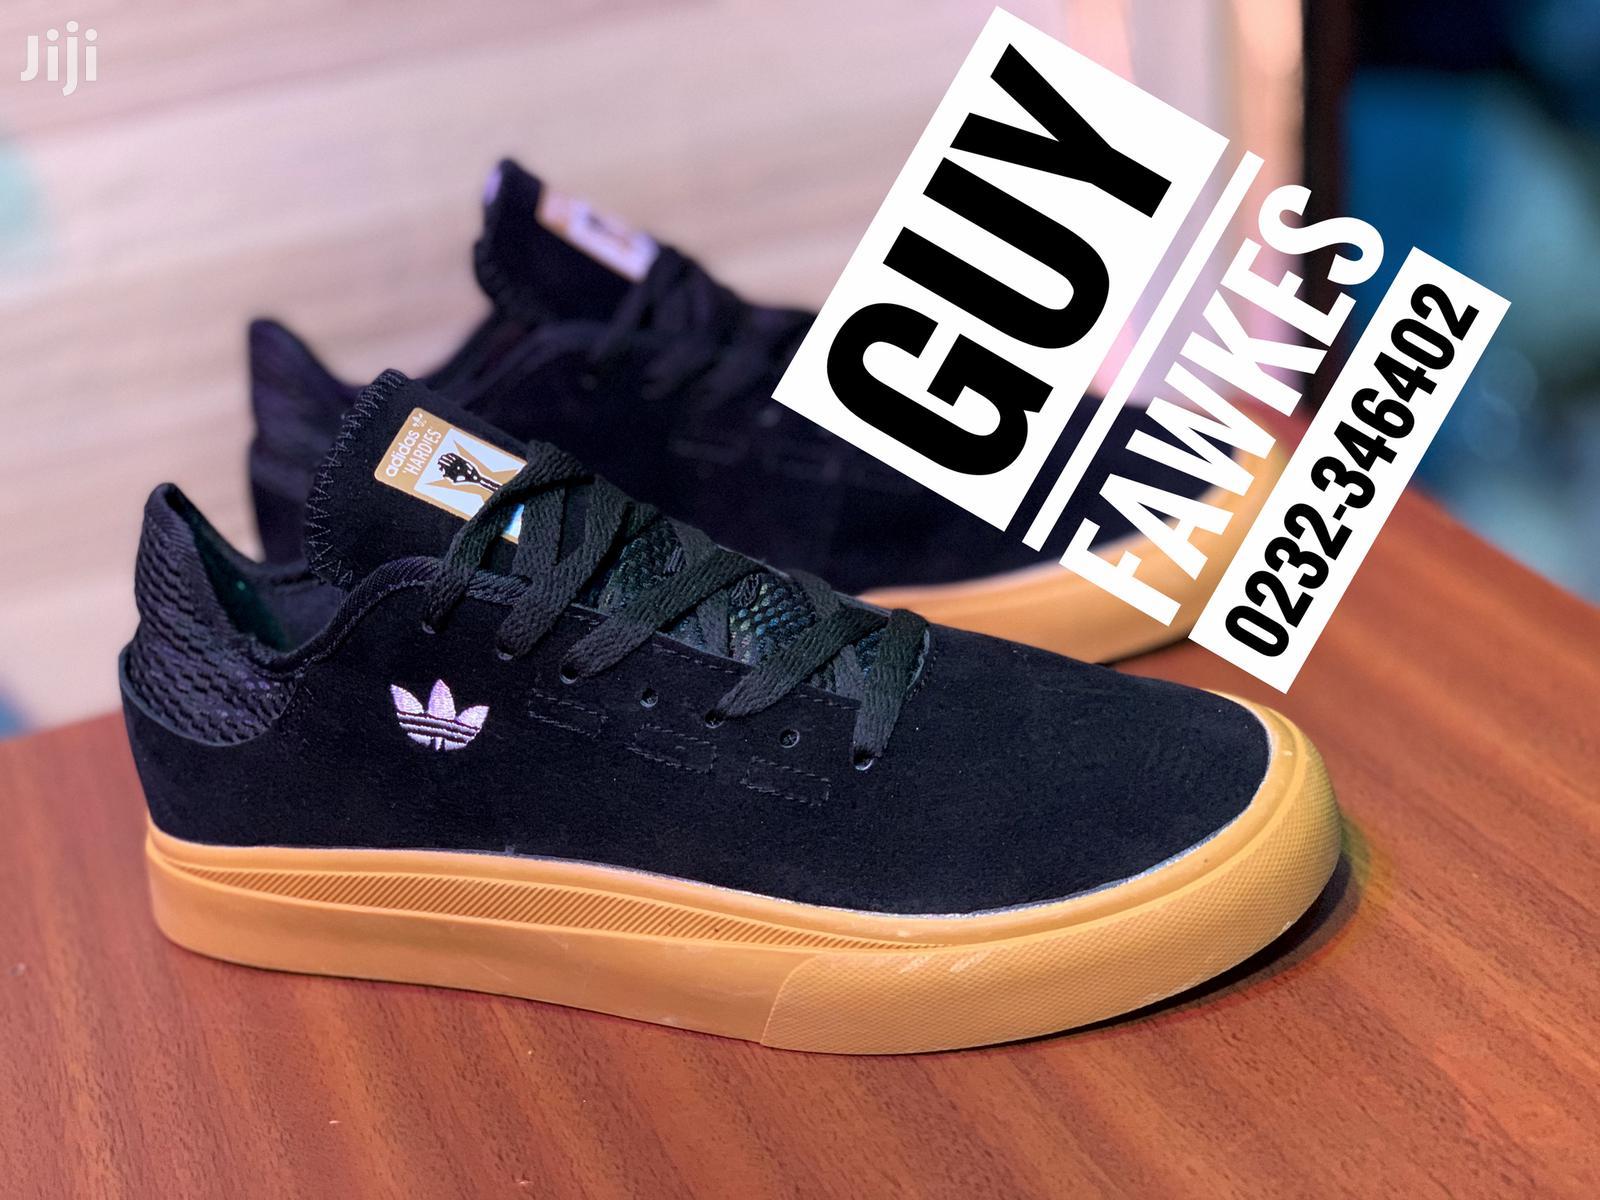 medida póngase en fila Parecer  Adidas Sabalo Hardies in Kumasi Metropolitan - Shoes, Bright Quache Wood |  Jiji.com.gh